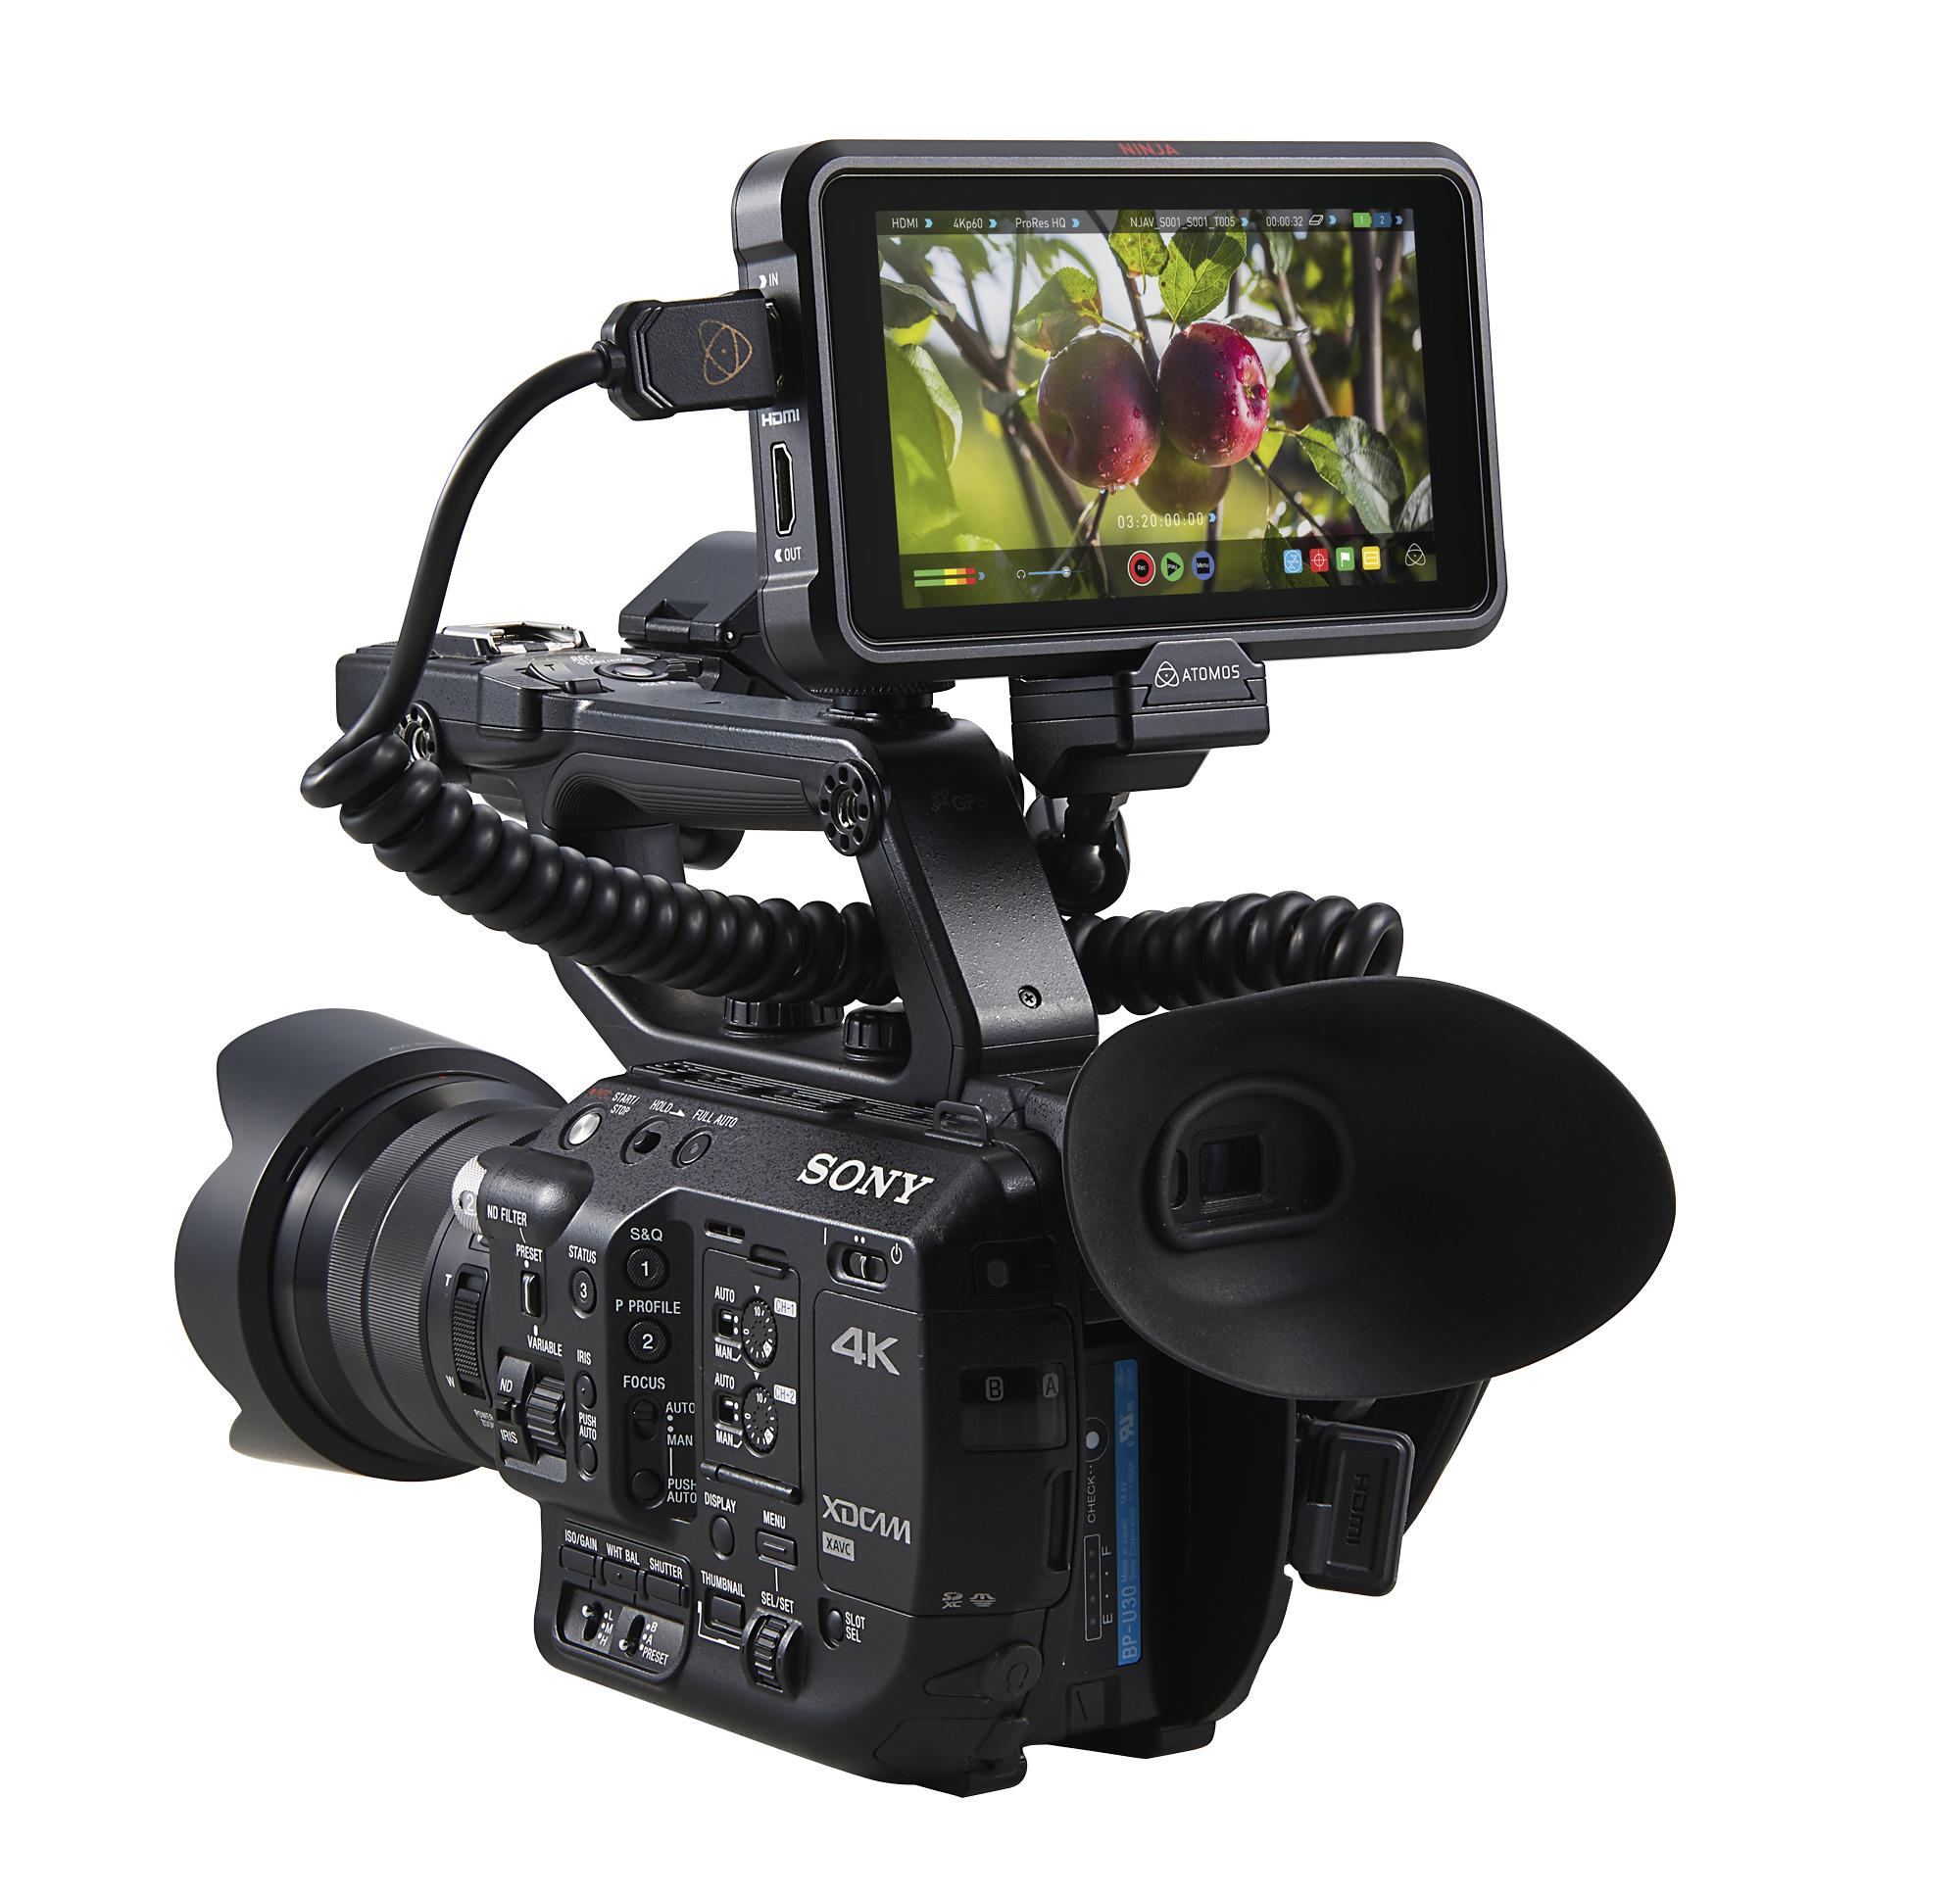 Atomos Ninja V 4Kp60 10bit HDR Daylight Viewable 1000nit Portable Monitor/Recorder - additional image 3